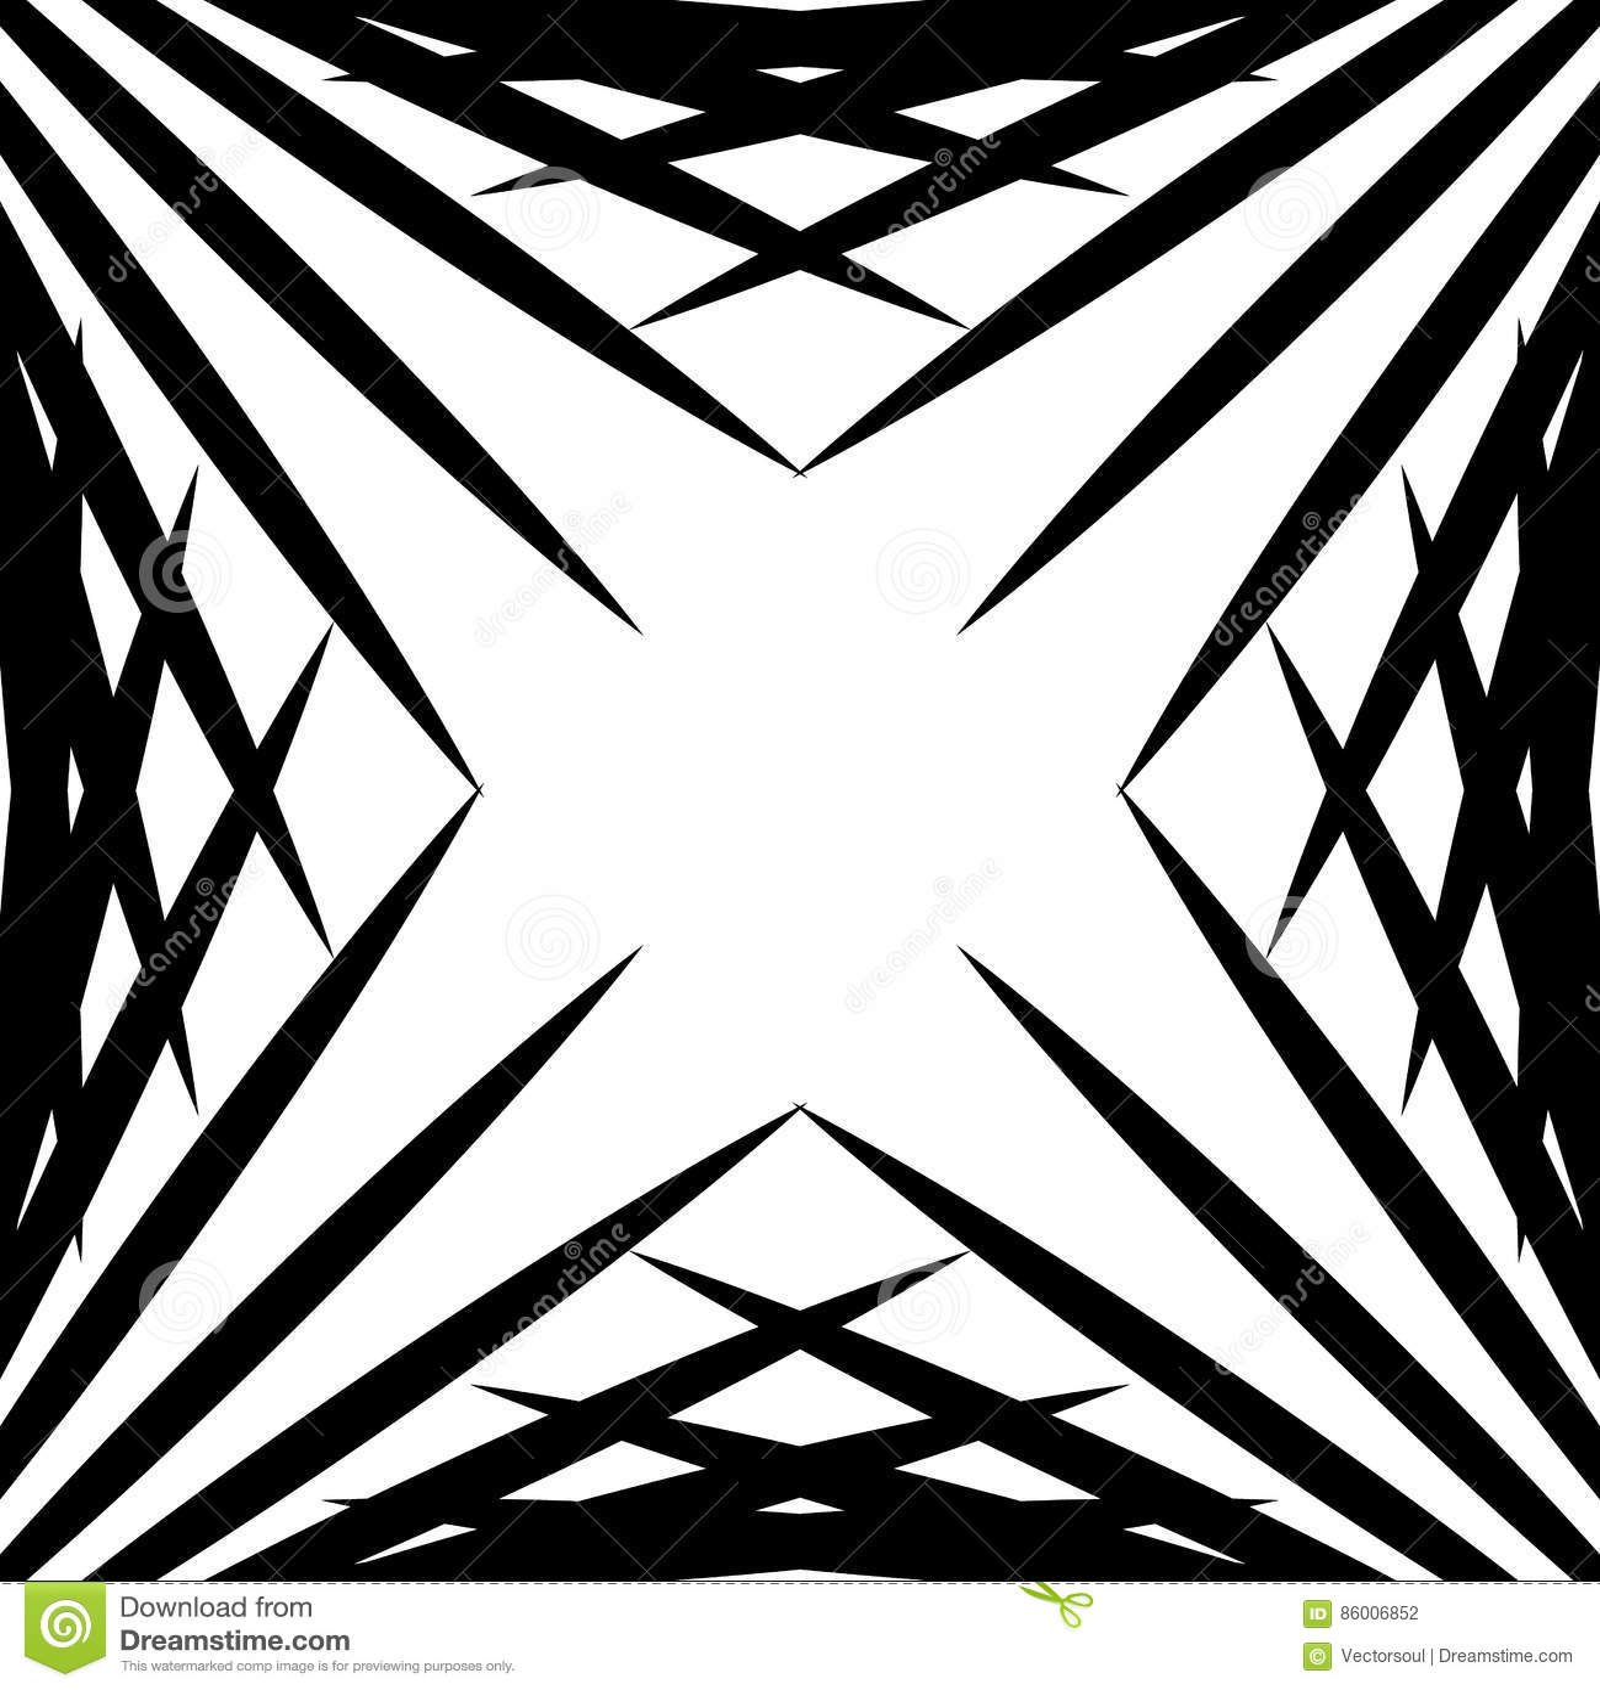 Gráfico geométrico Squarish hecho de líneas acentuadas Geométrico nervioso